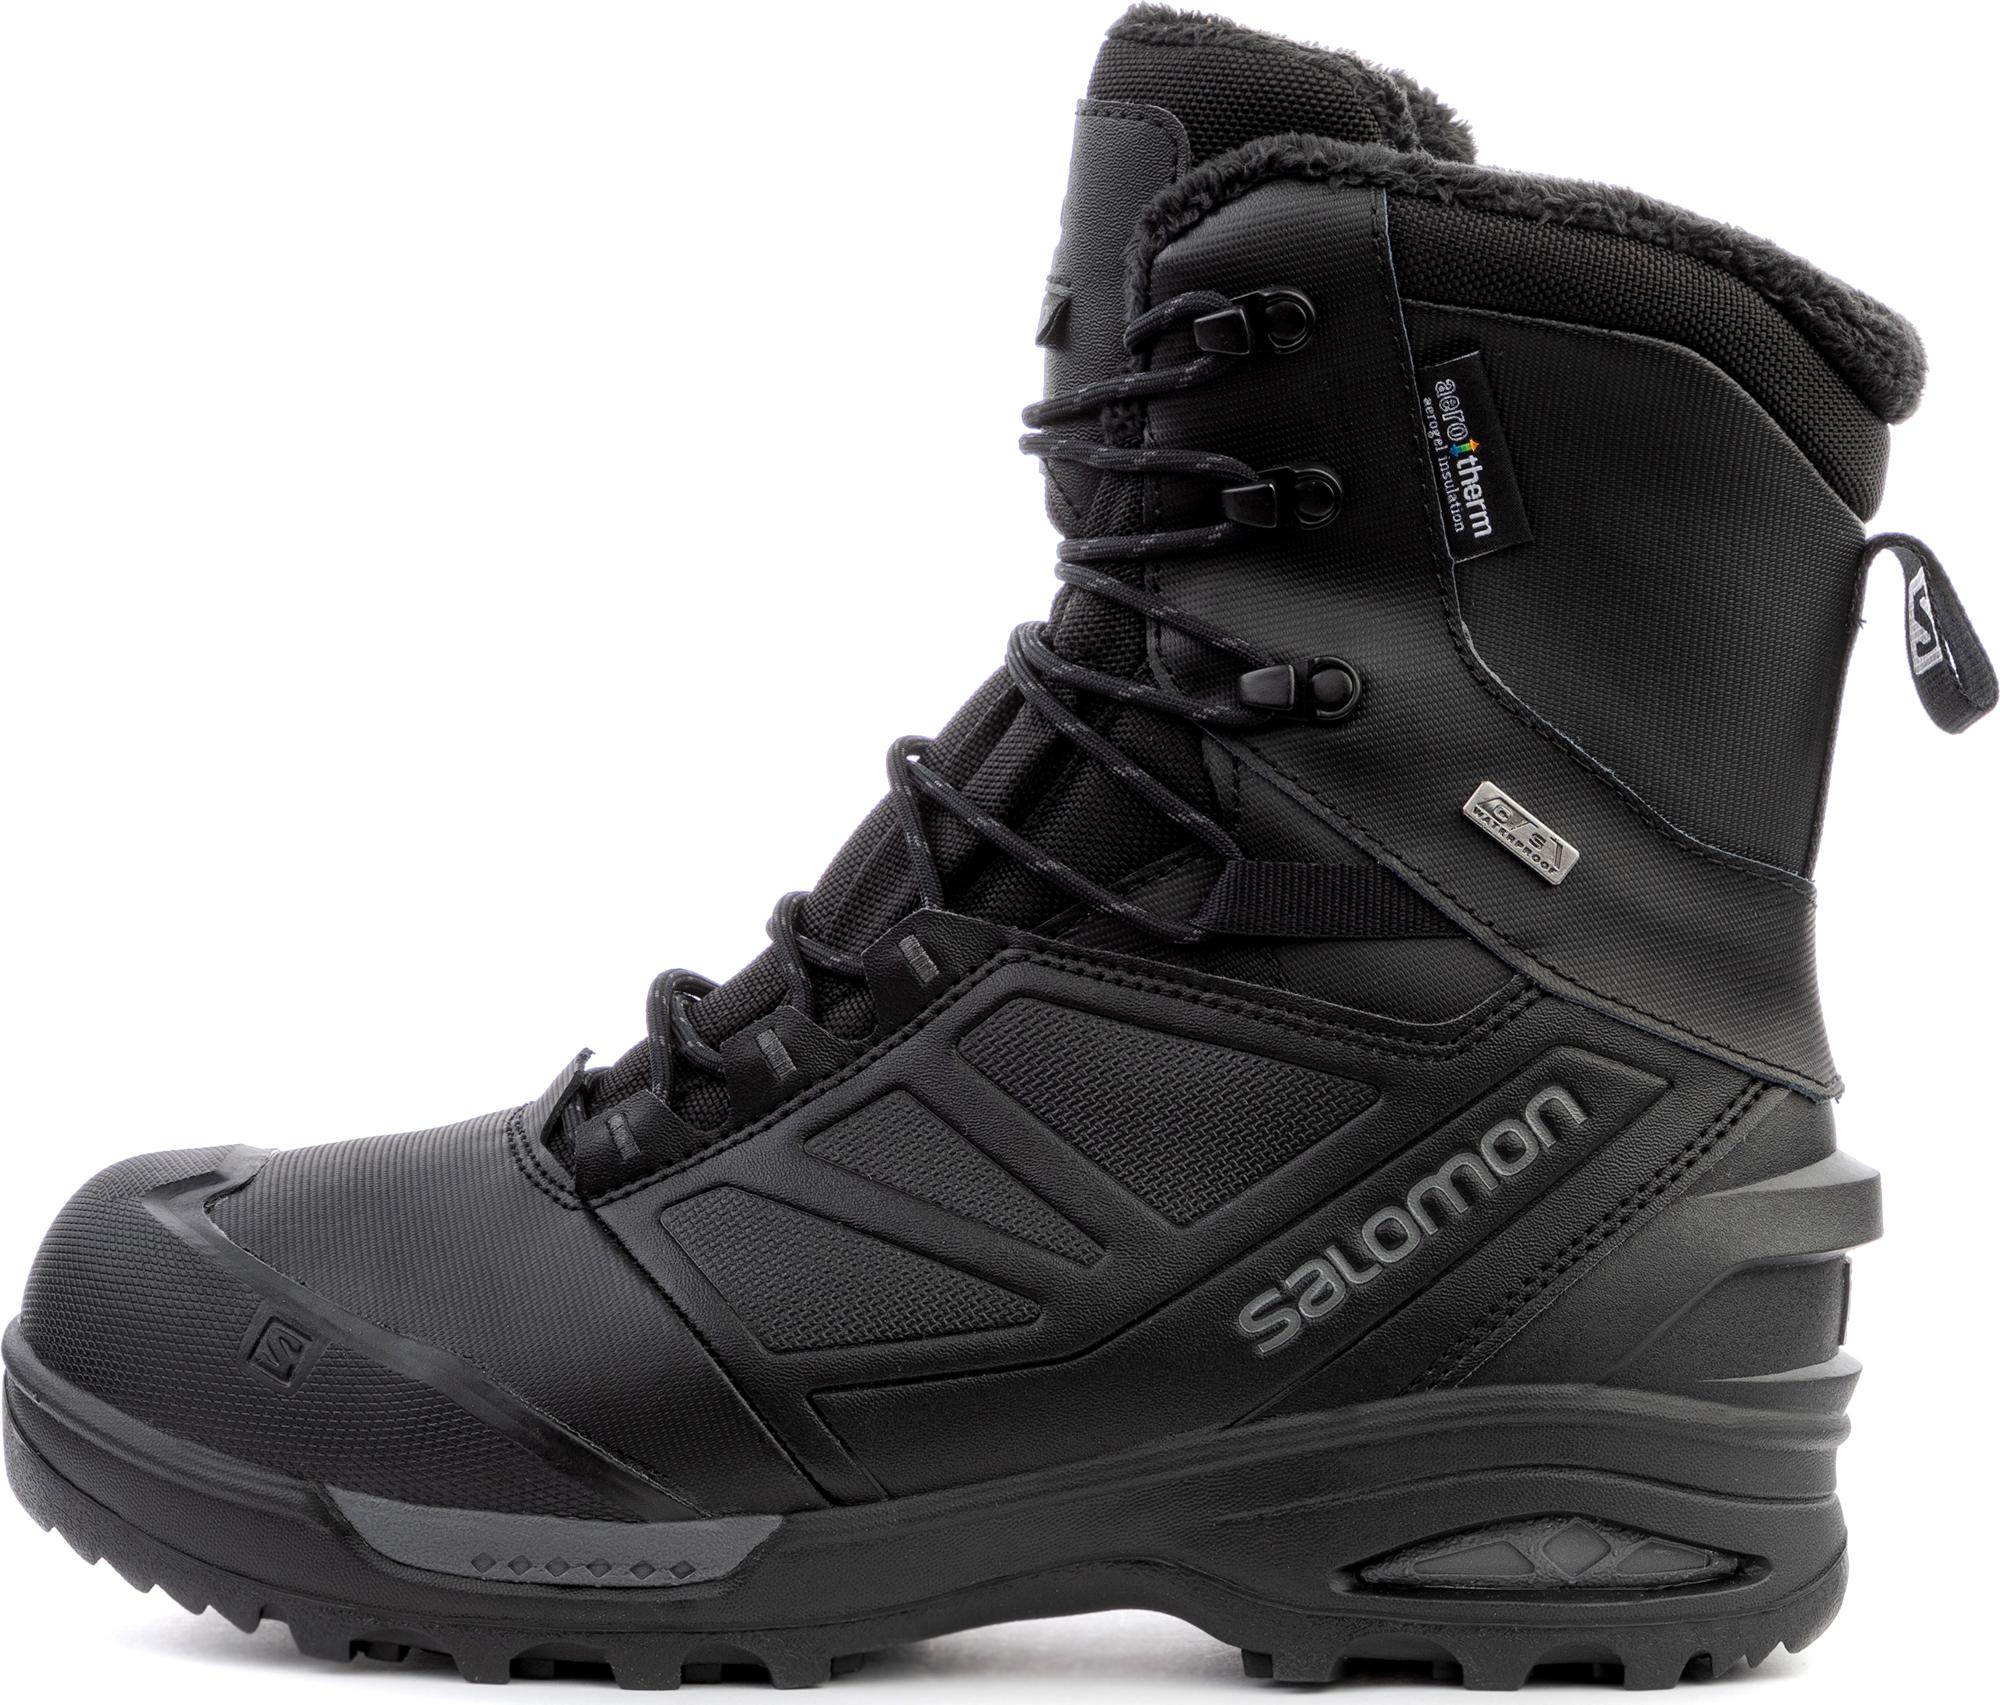 Salomon Сапоги утепленные мужские Salomon Toundra Pro, размер 40 salomon ботинки утепленные мужские salomon crusano размер 40